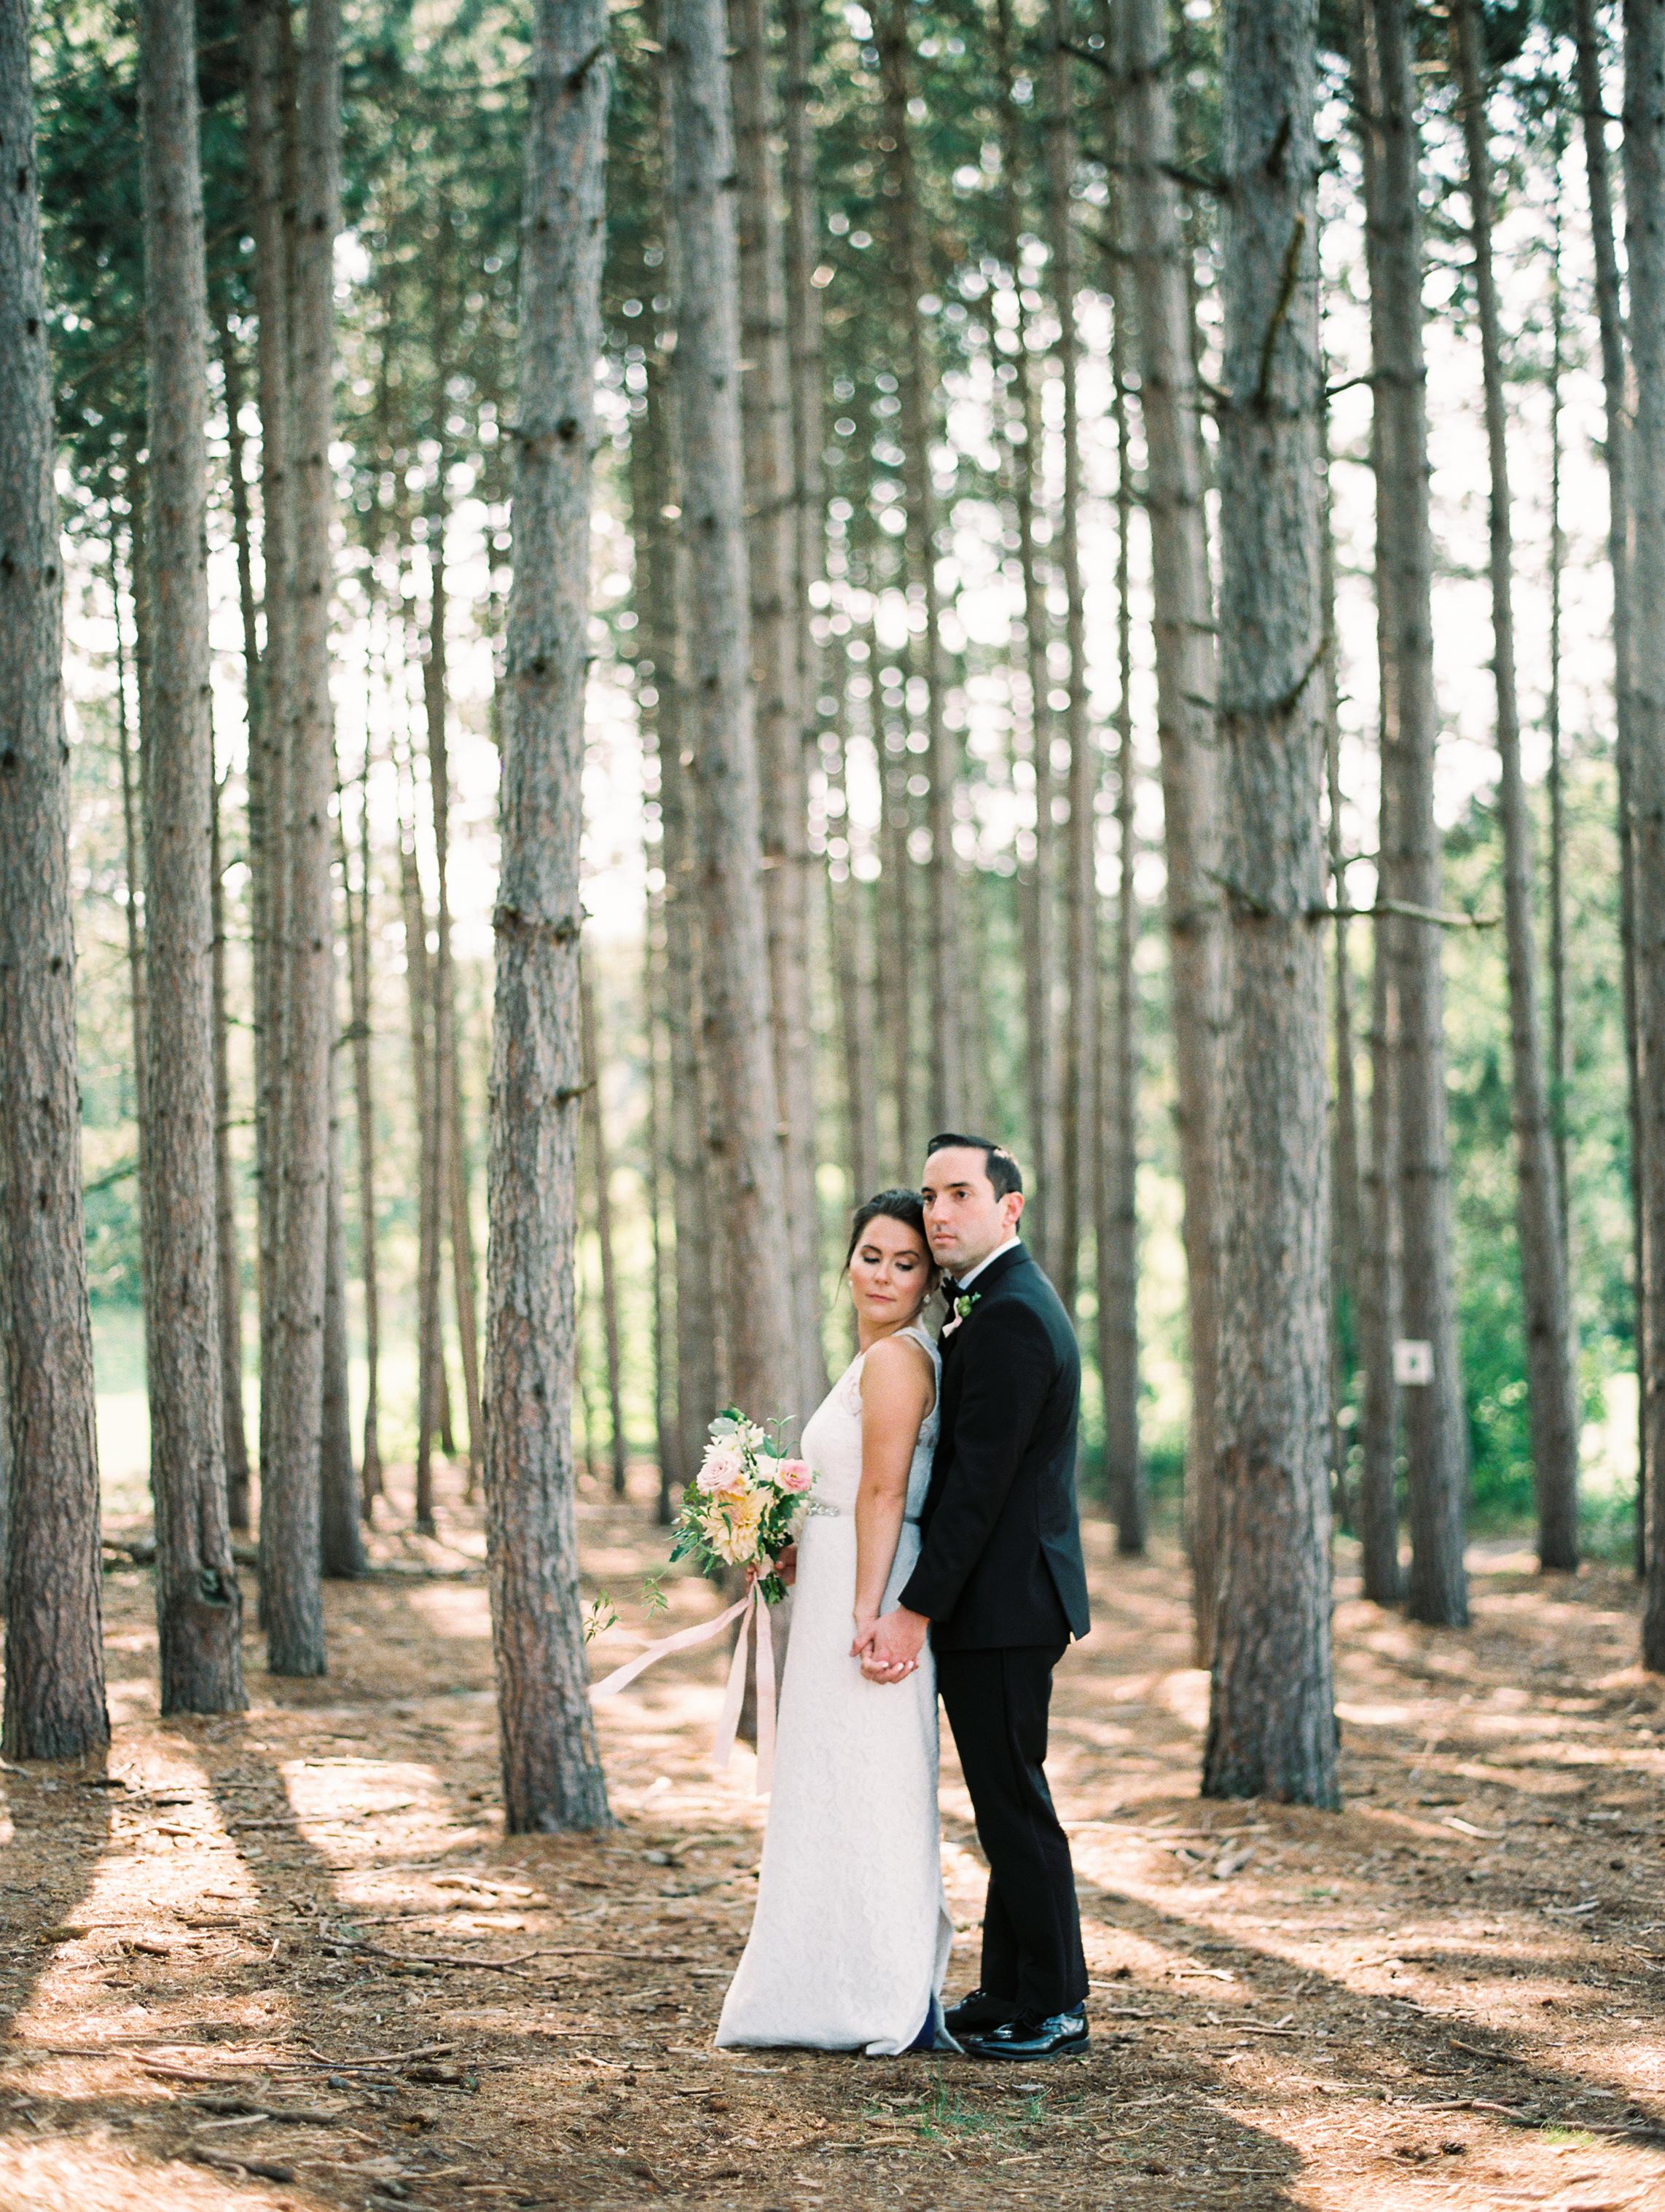 Zoller+Wedding+Bridal+Partyf-68.jpg